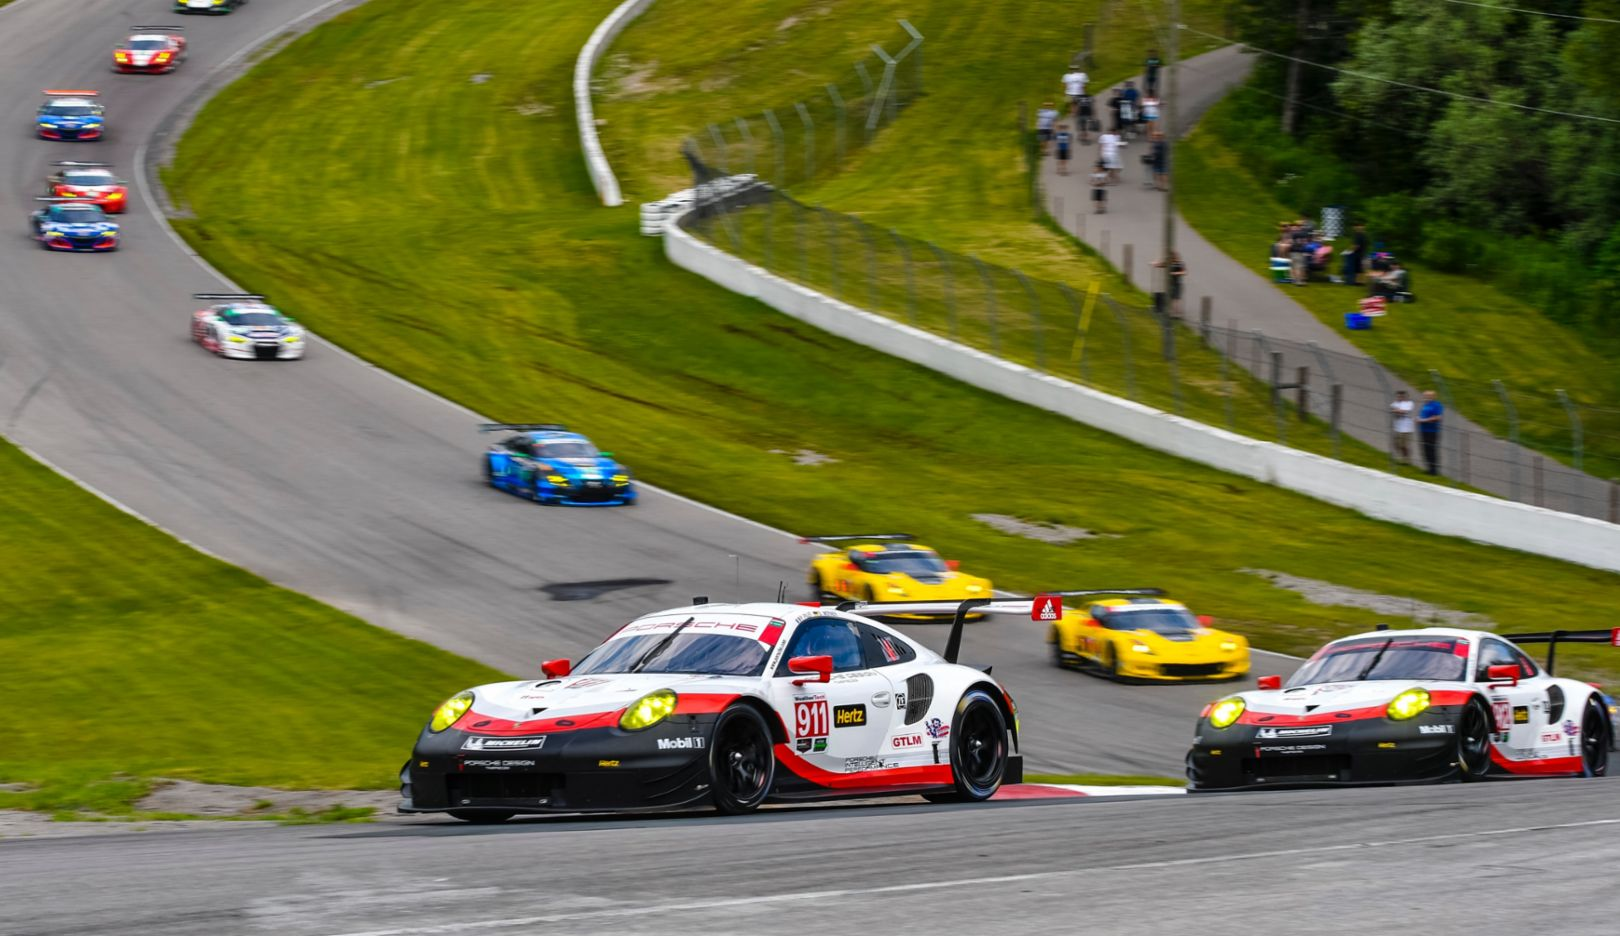 911 RSR, IMSA WeatherTech Sportscar Championship, race, Bowmanville, Canada, 2017, Porsche AG